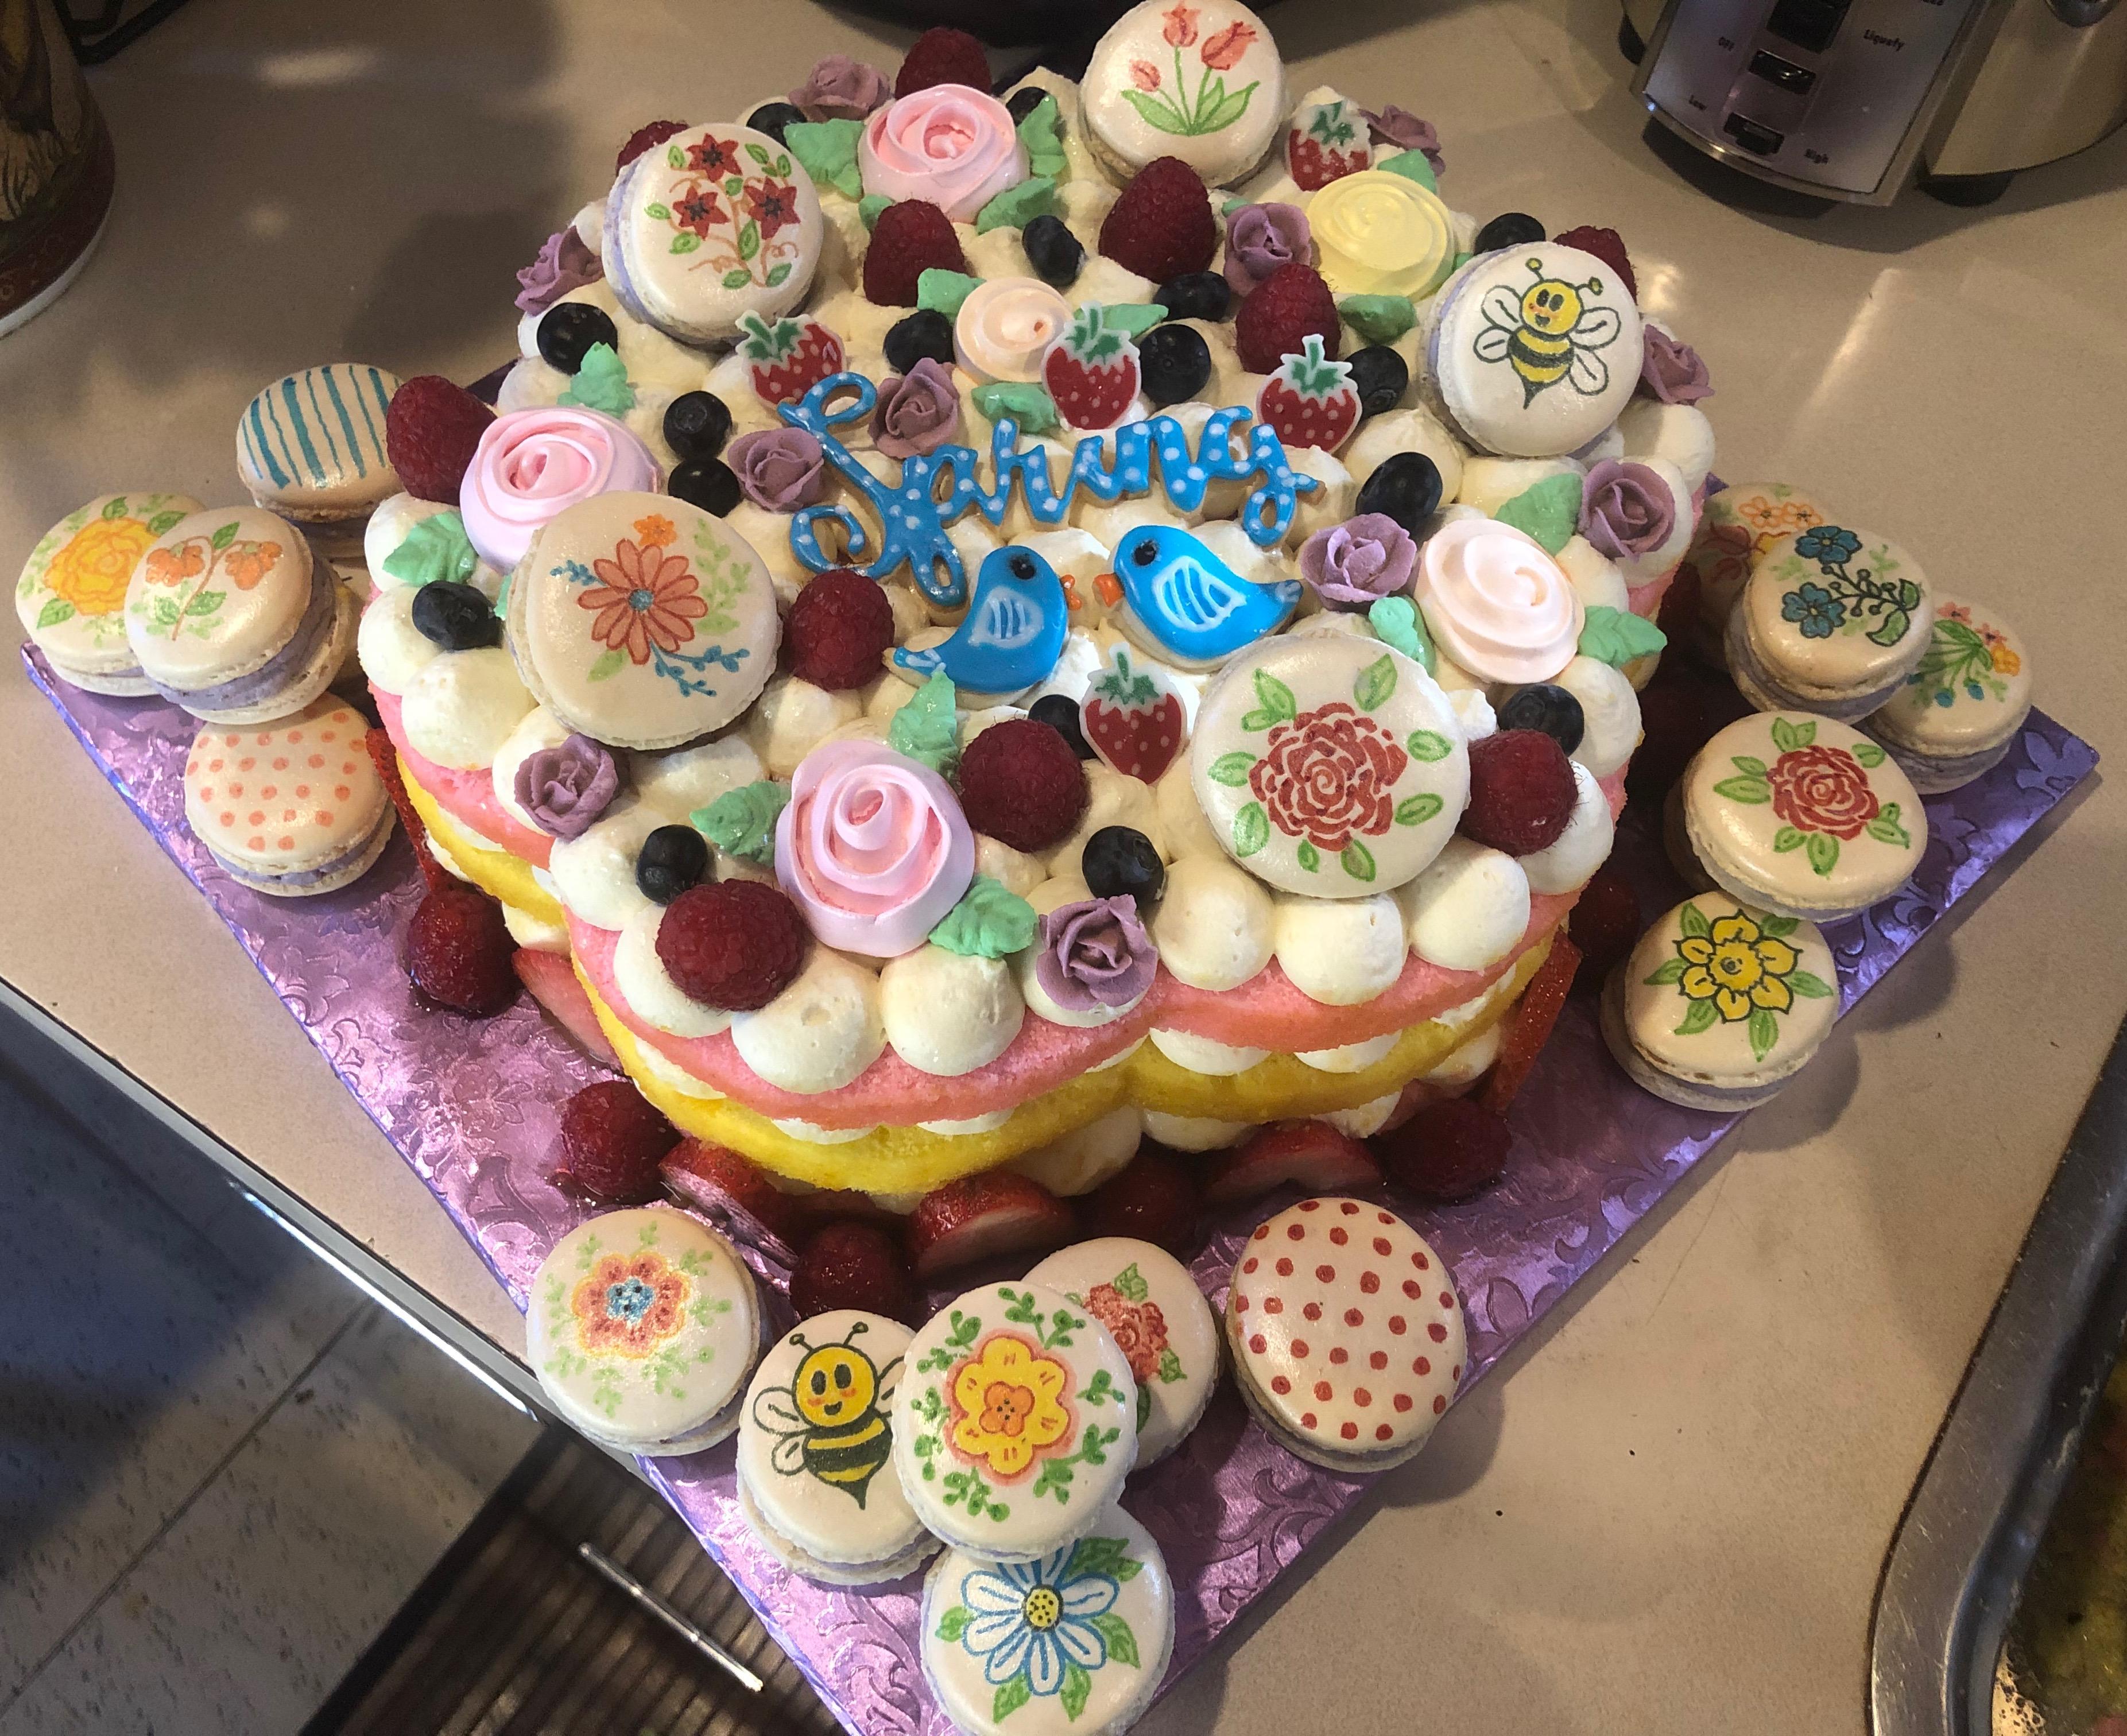 Springtime cake for Port Townsend Education Foundation fundraiser